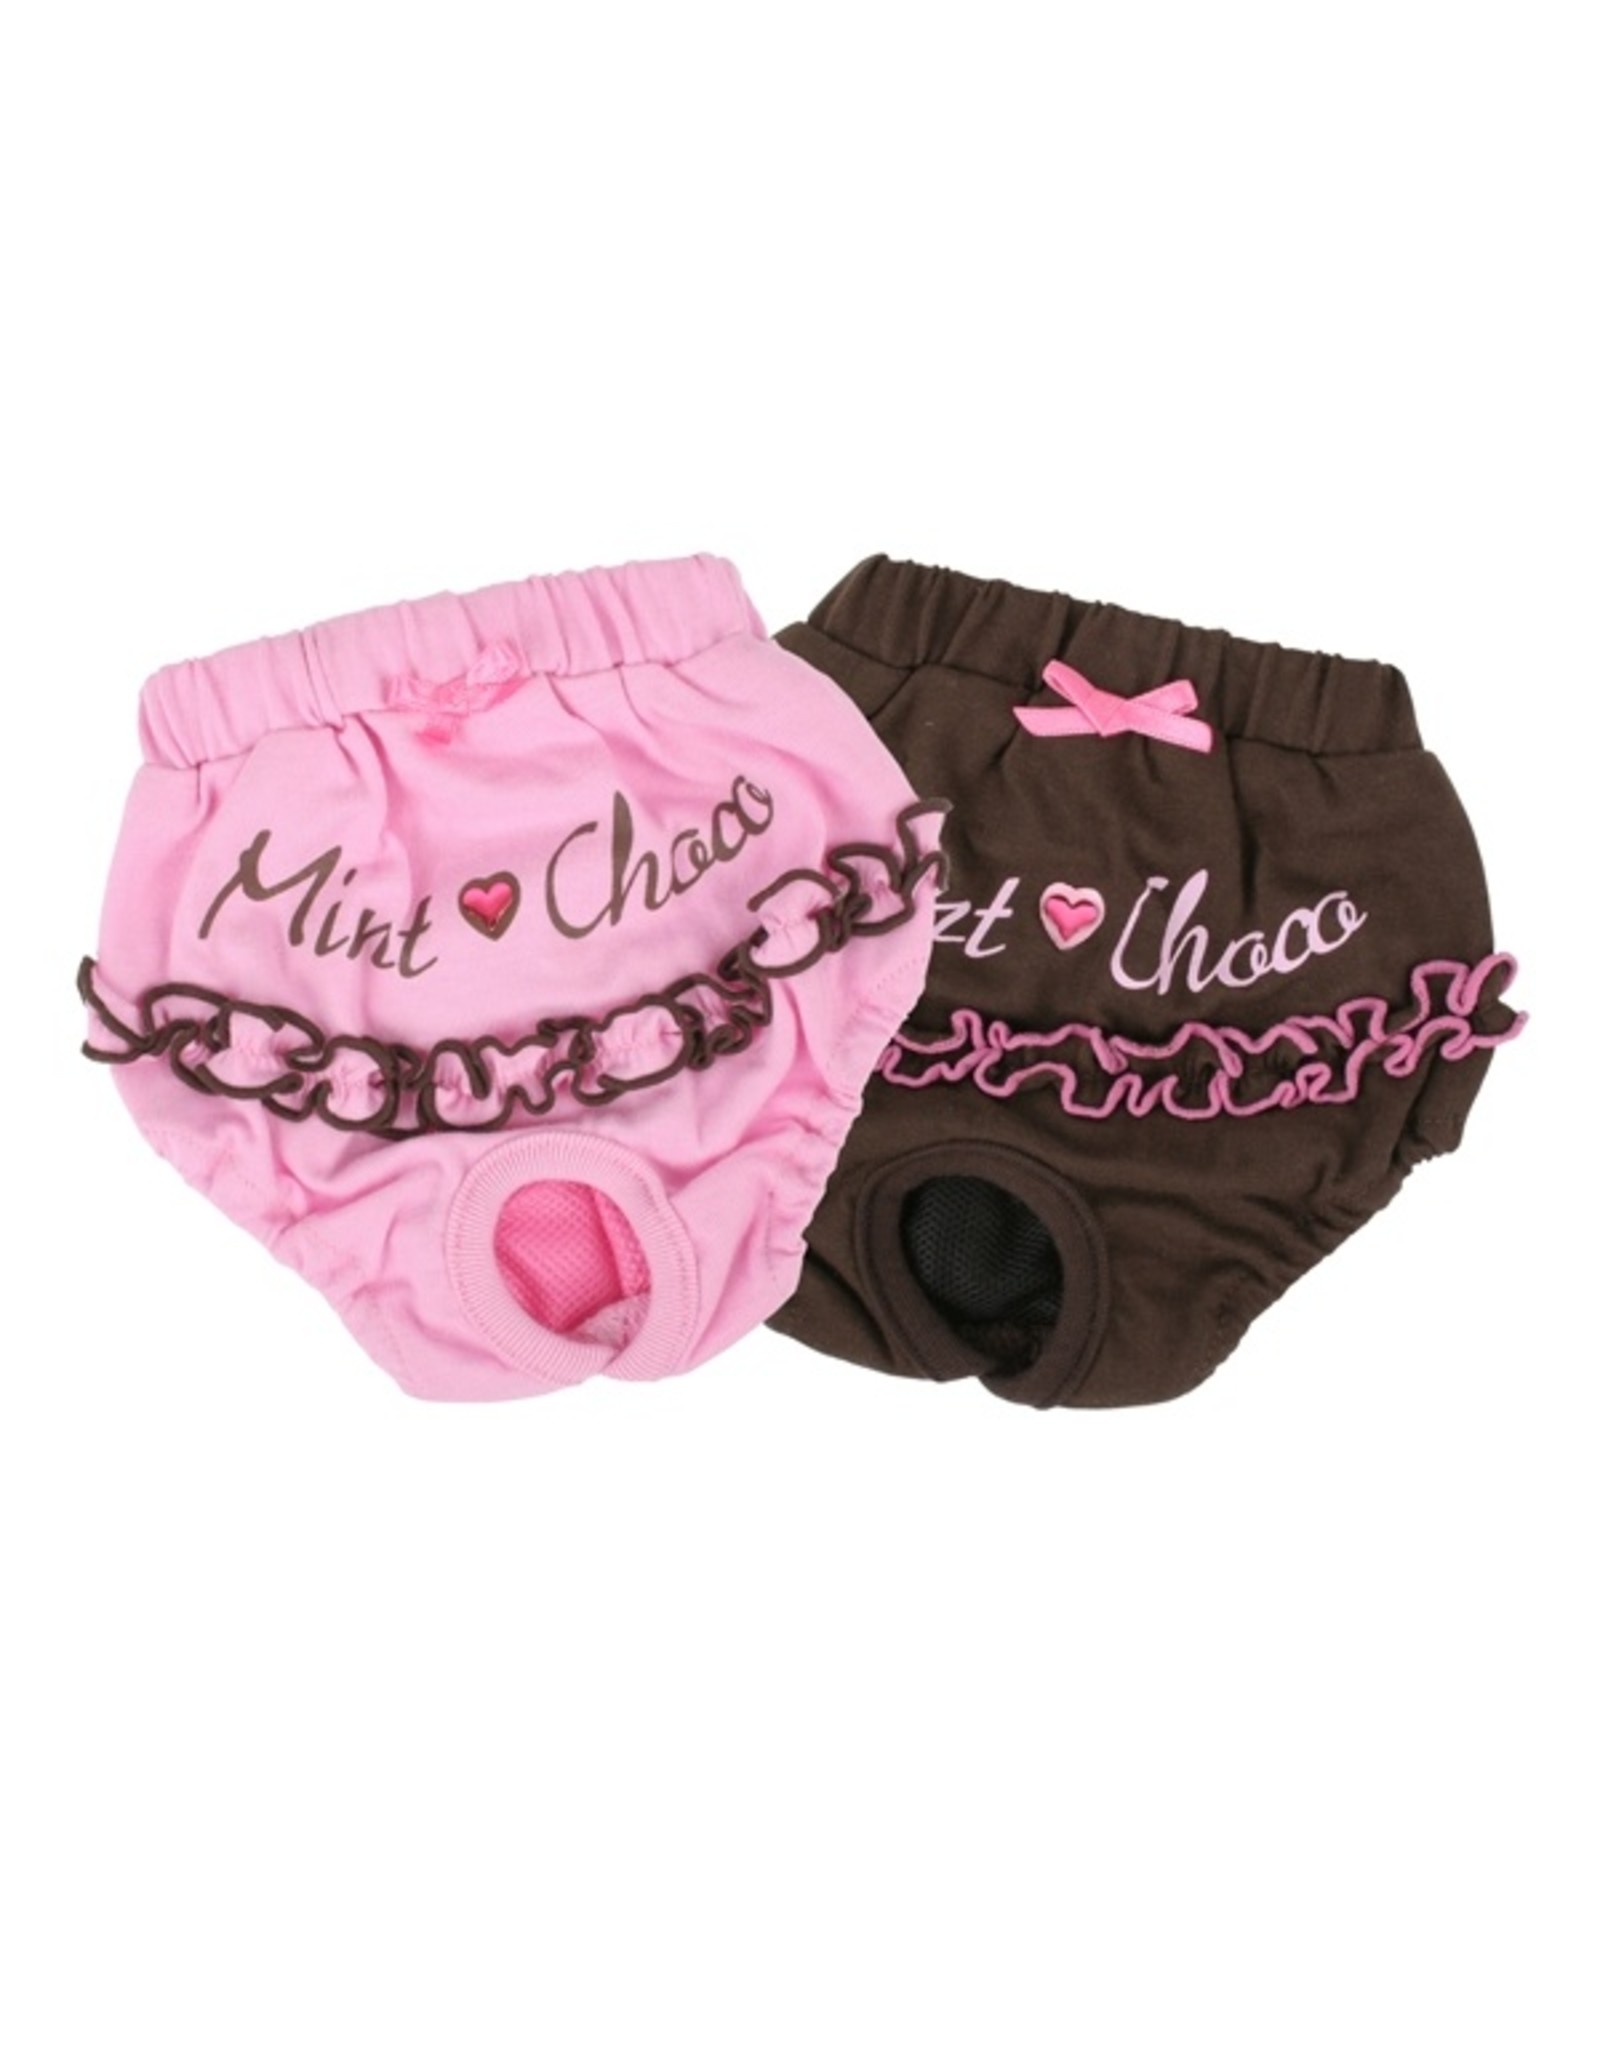 Pinkaholic Pinkaholic Mint Choco Sanitary panty Pink ALLEEN MEDIUM